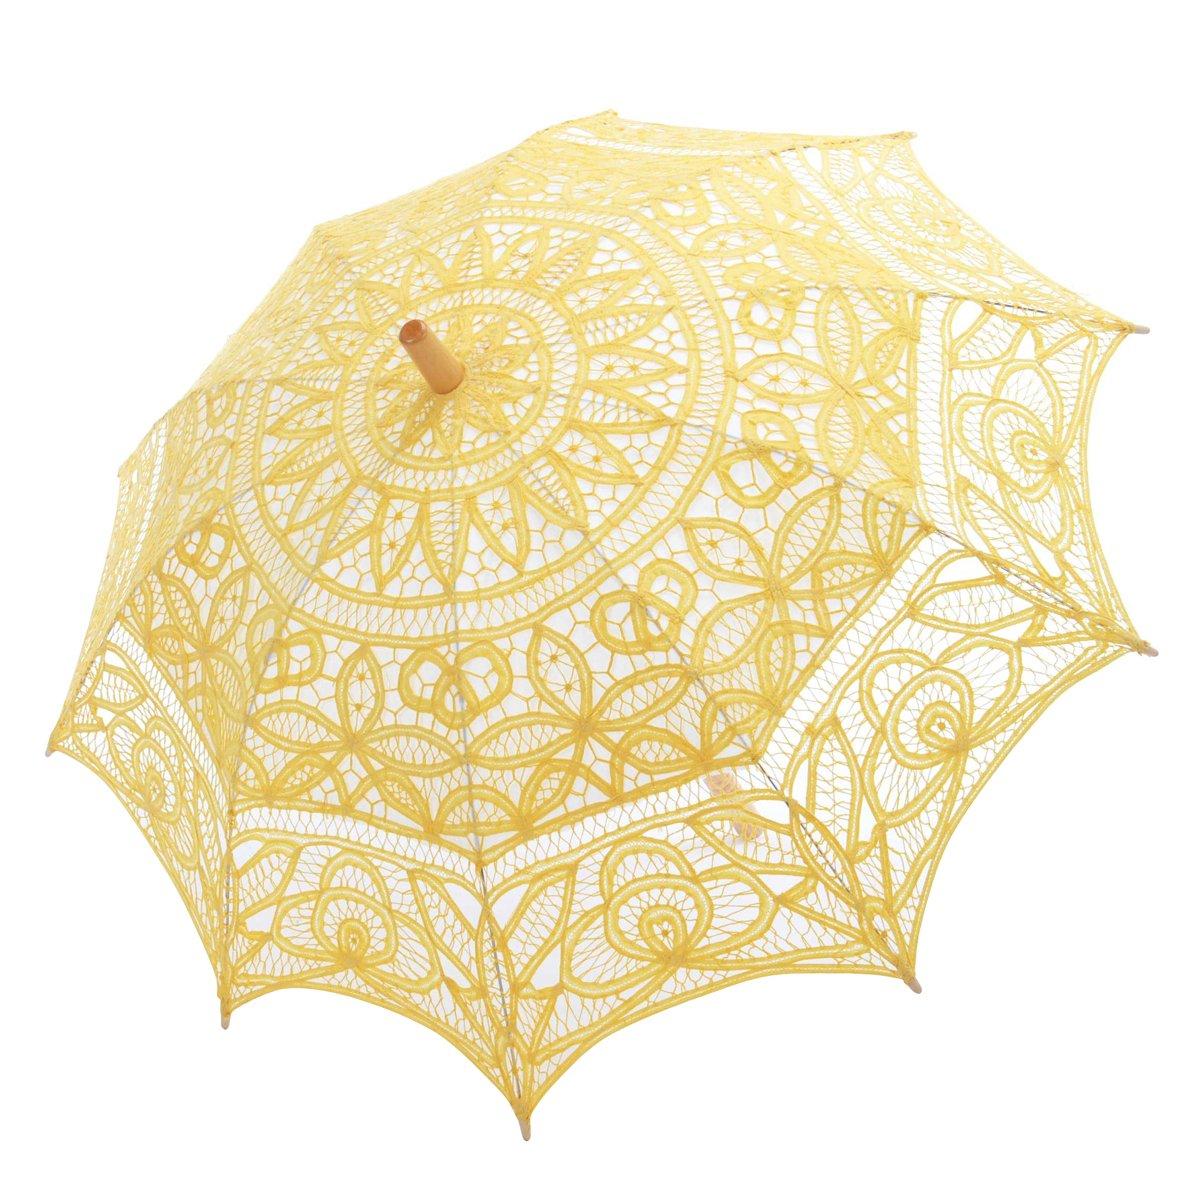 Topwedding Battenburg Lace Outdoor Wedding Parasol Bridal Shower Umbrella, Yellow